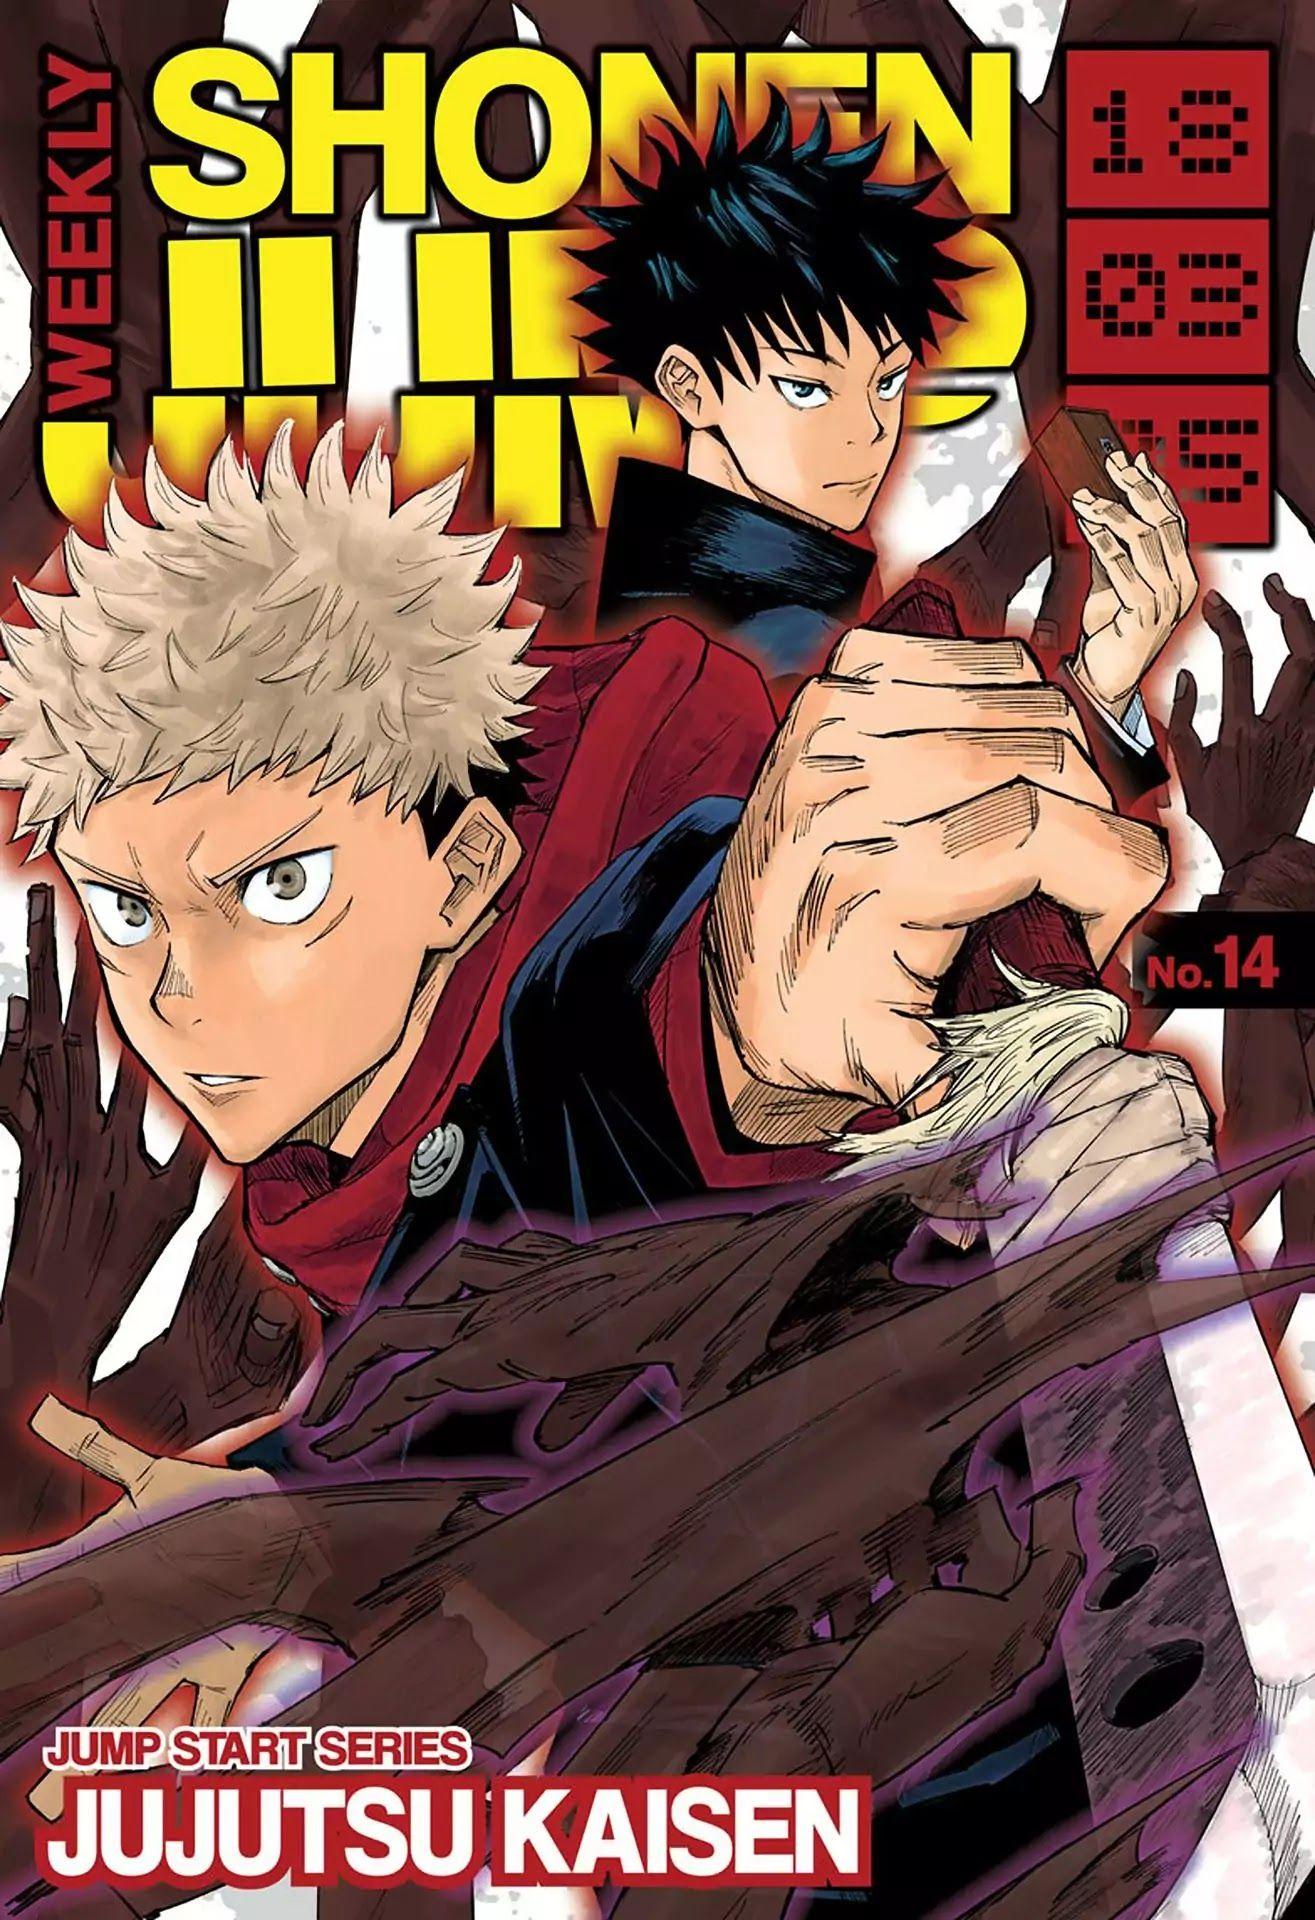 Jujutsu Kaisen Manga Covers Jujutsu Manga